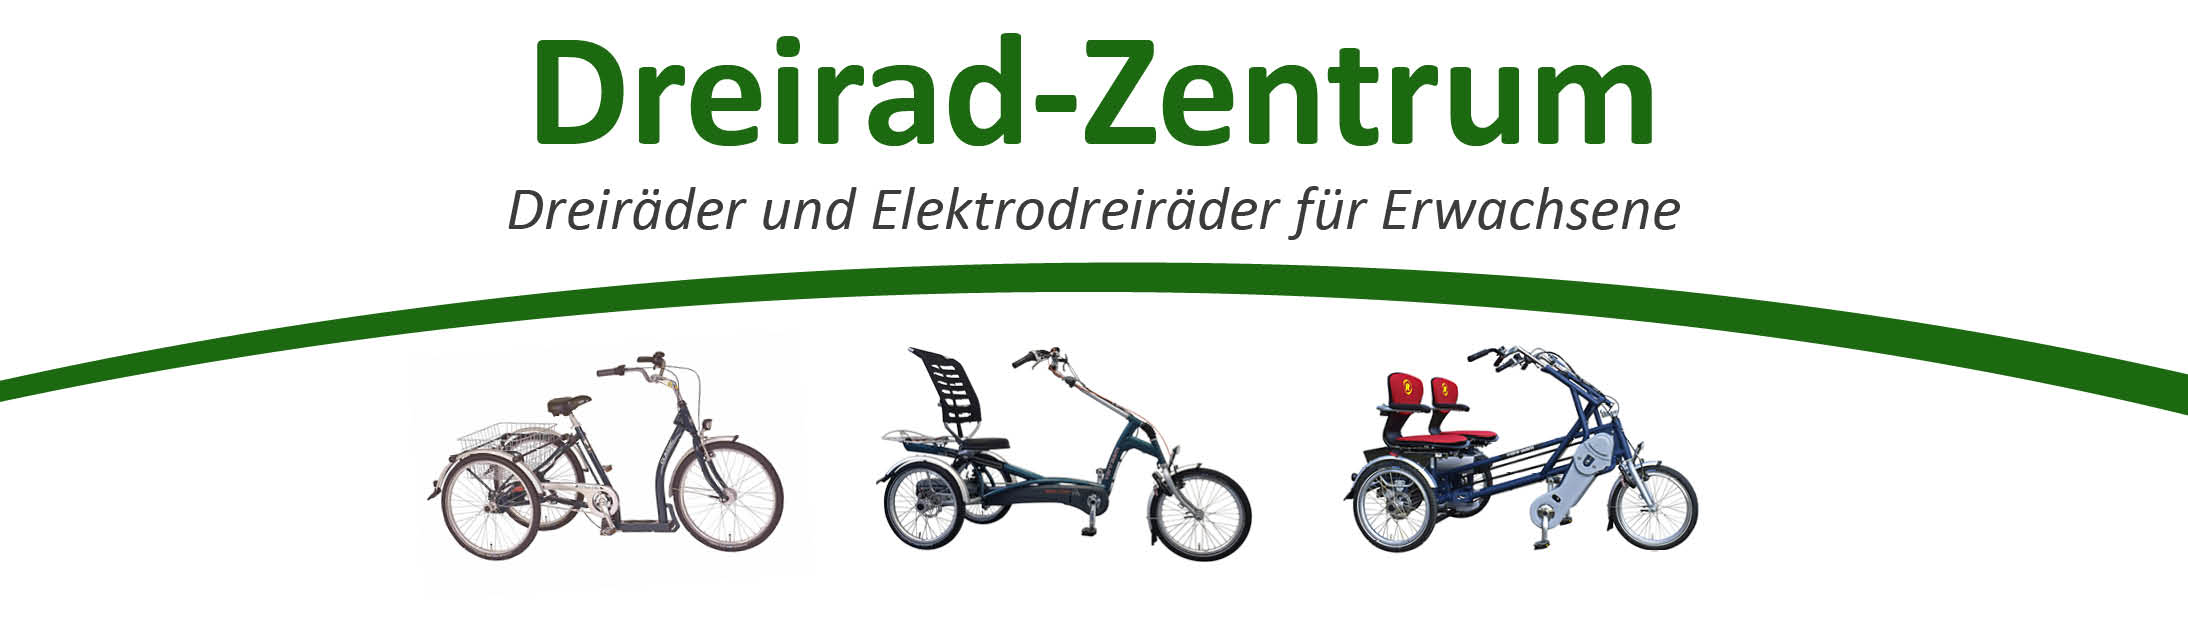 Krankenkasse Zahlt Elektrodreirad Dreirad Zentrum